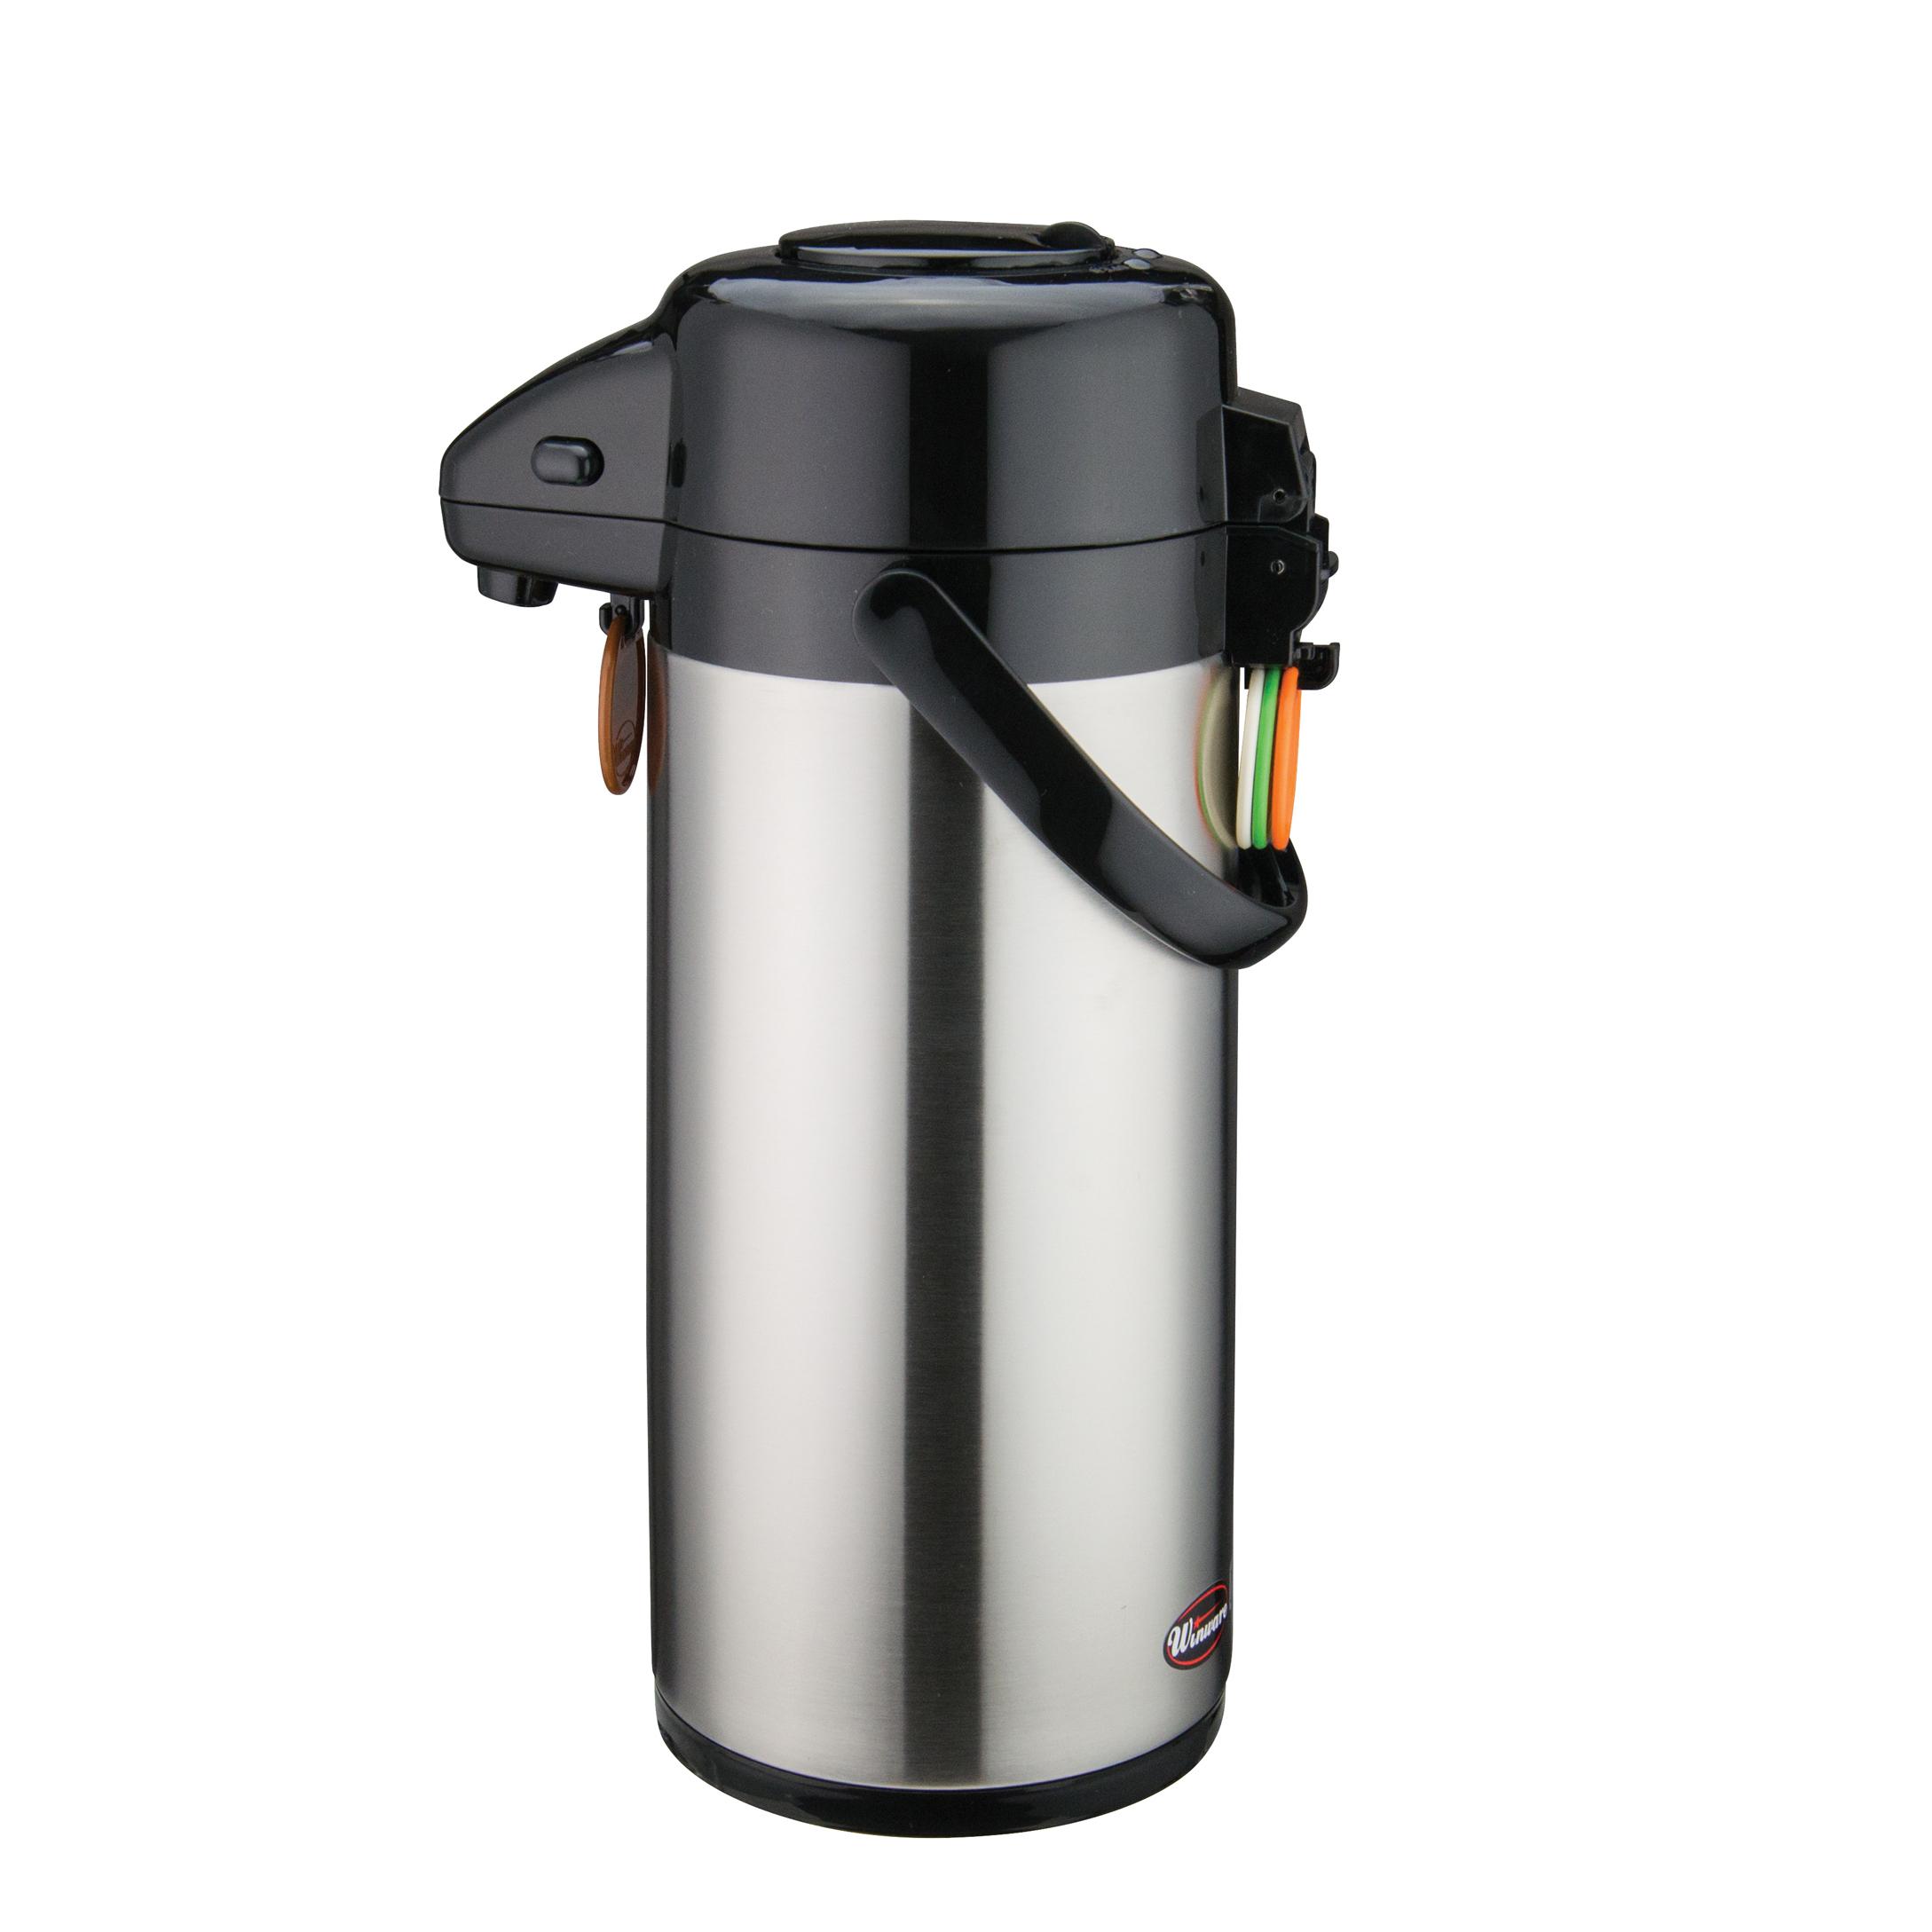 4000-44 Winco APSP-925 airpot